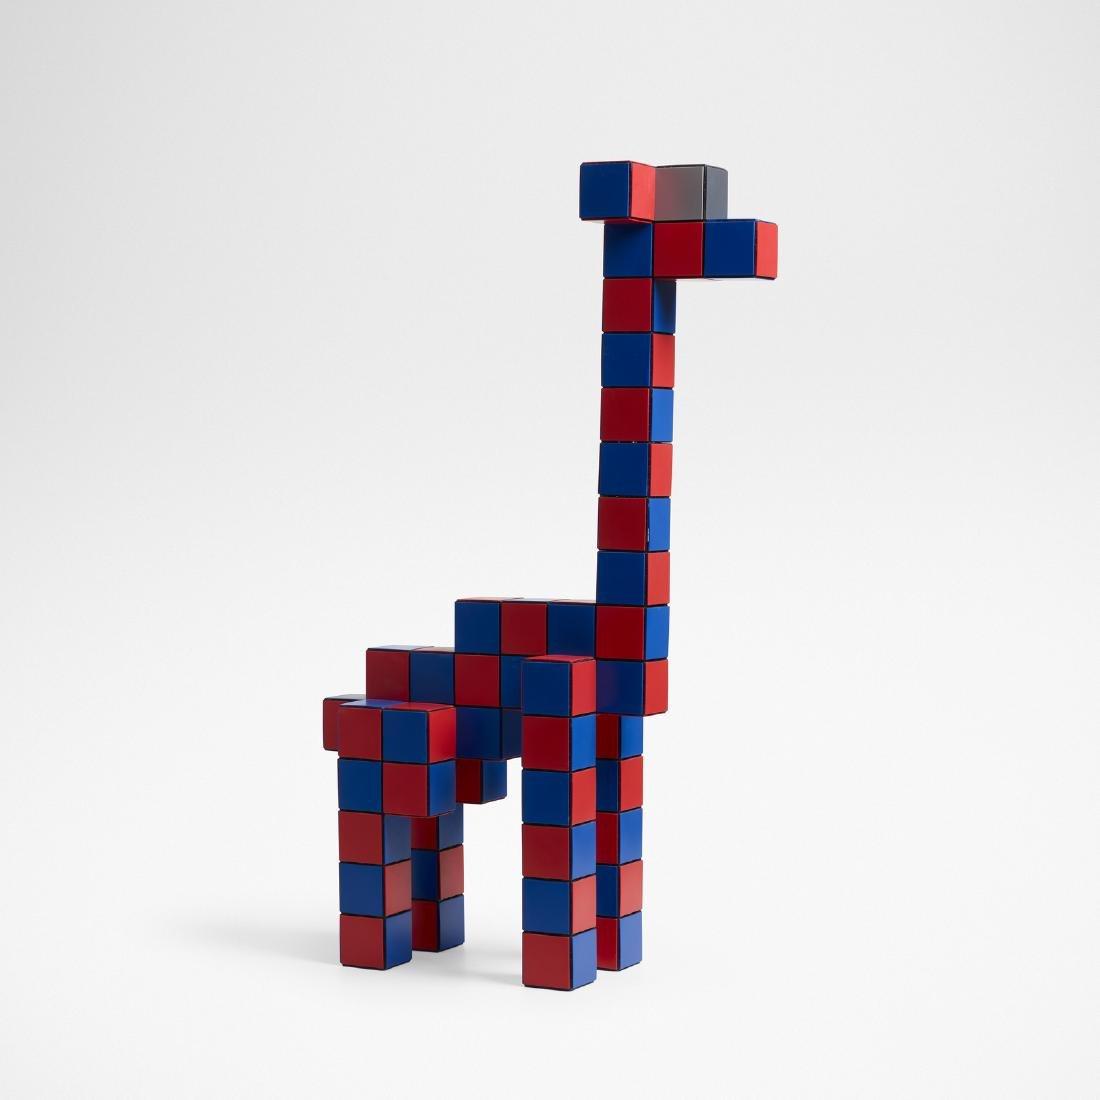 Verner Panton, Pantonaef toy sculpture